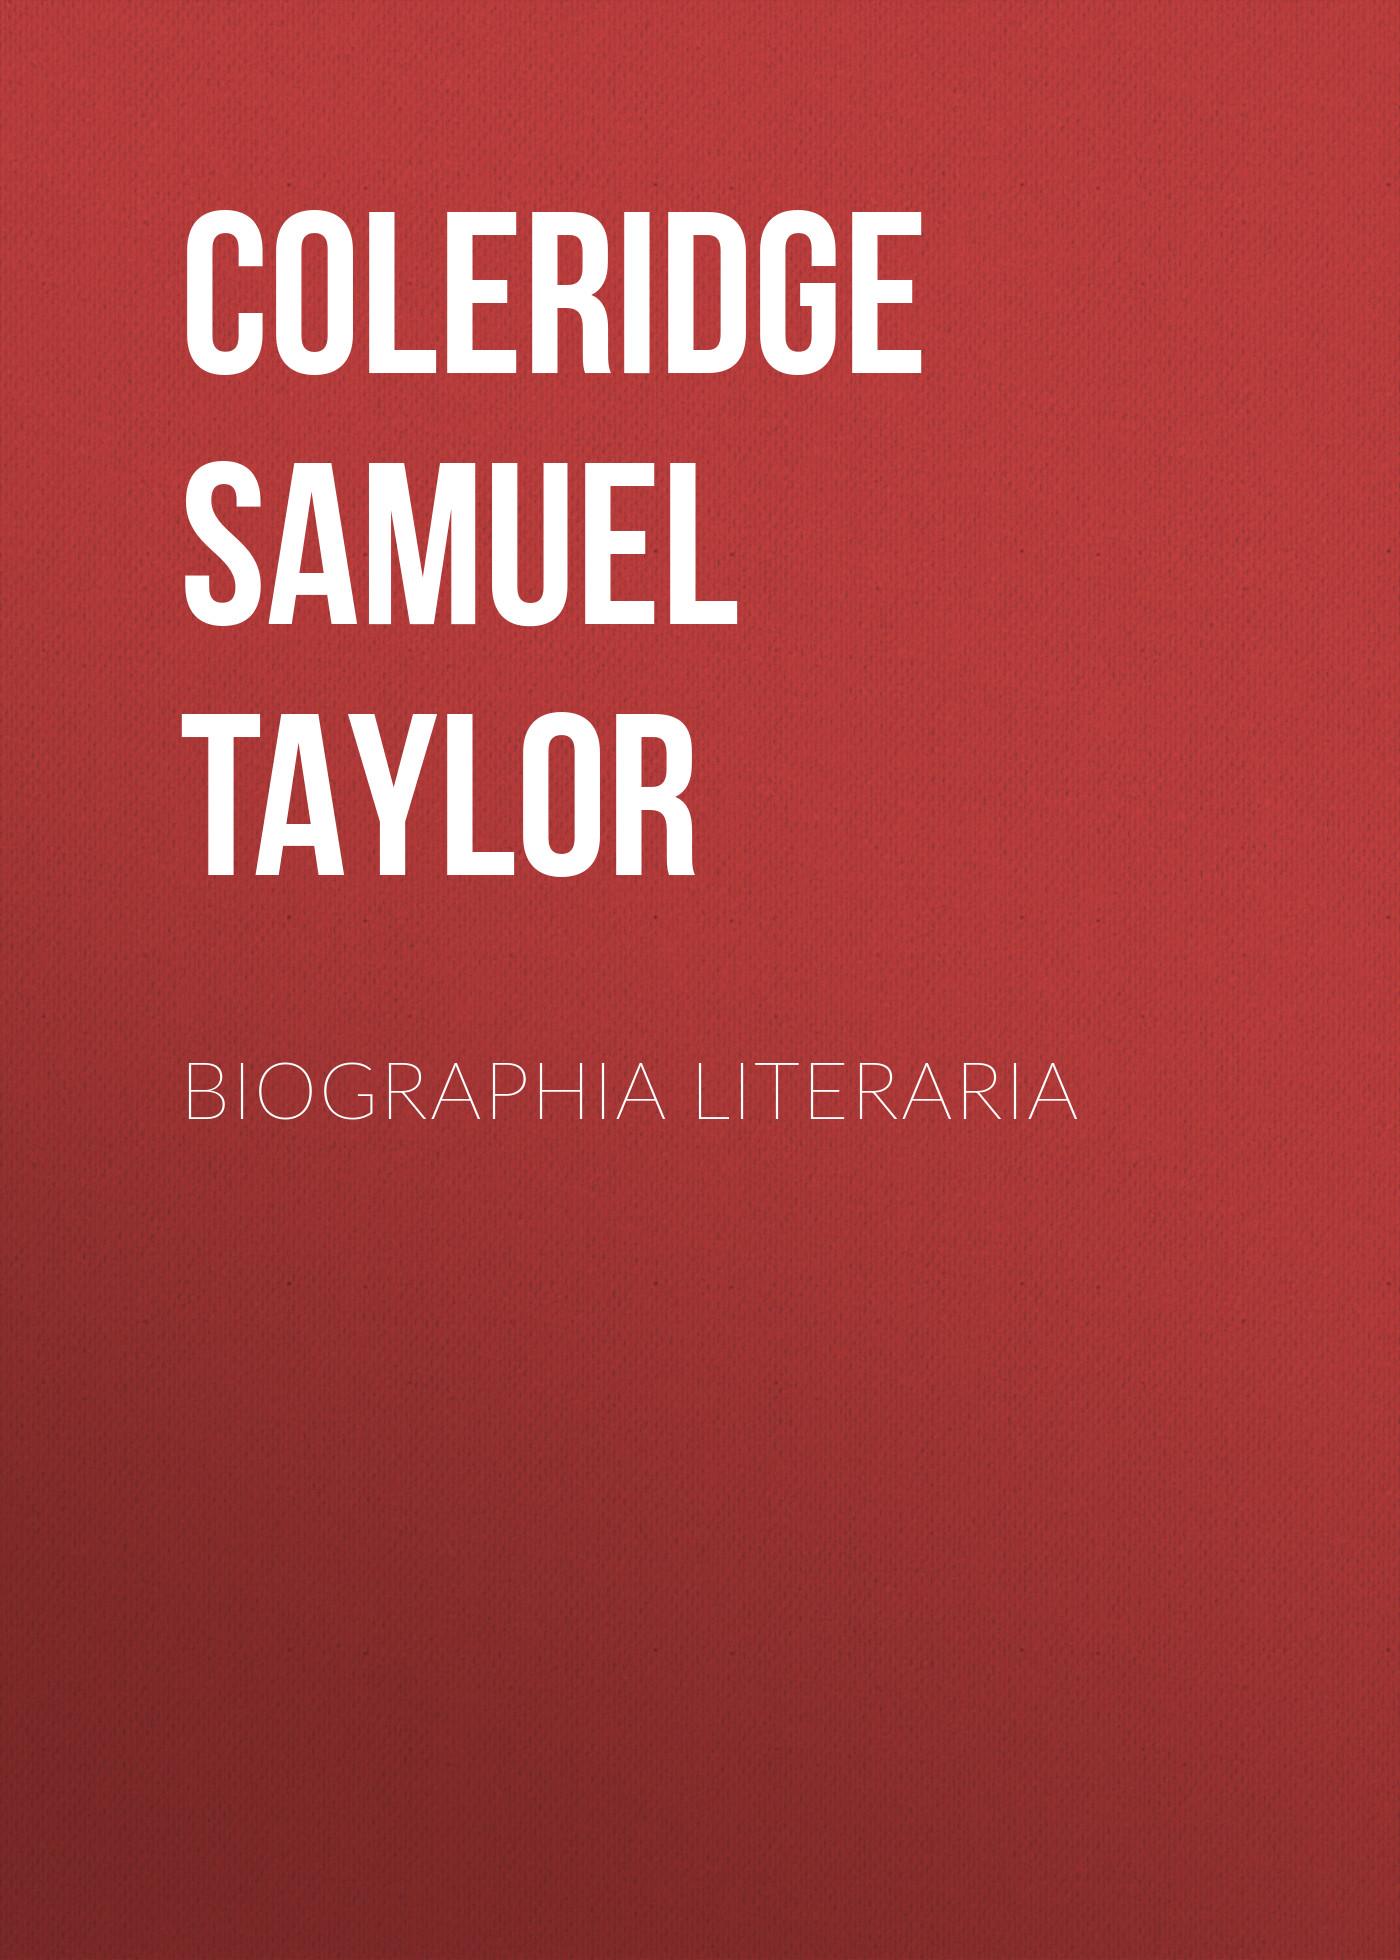 цена Coleridge Samuel Taylor Biographia Literaria